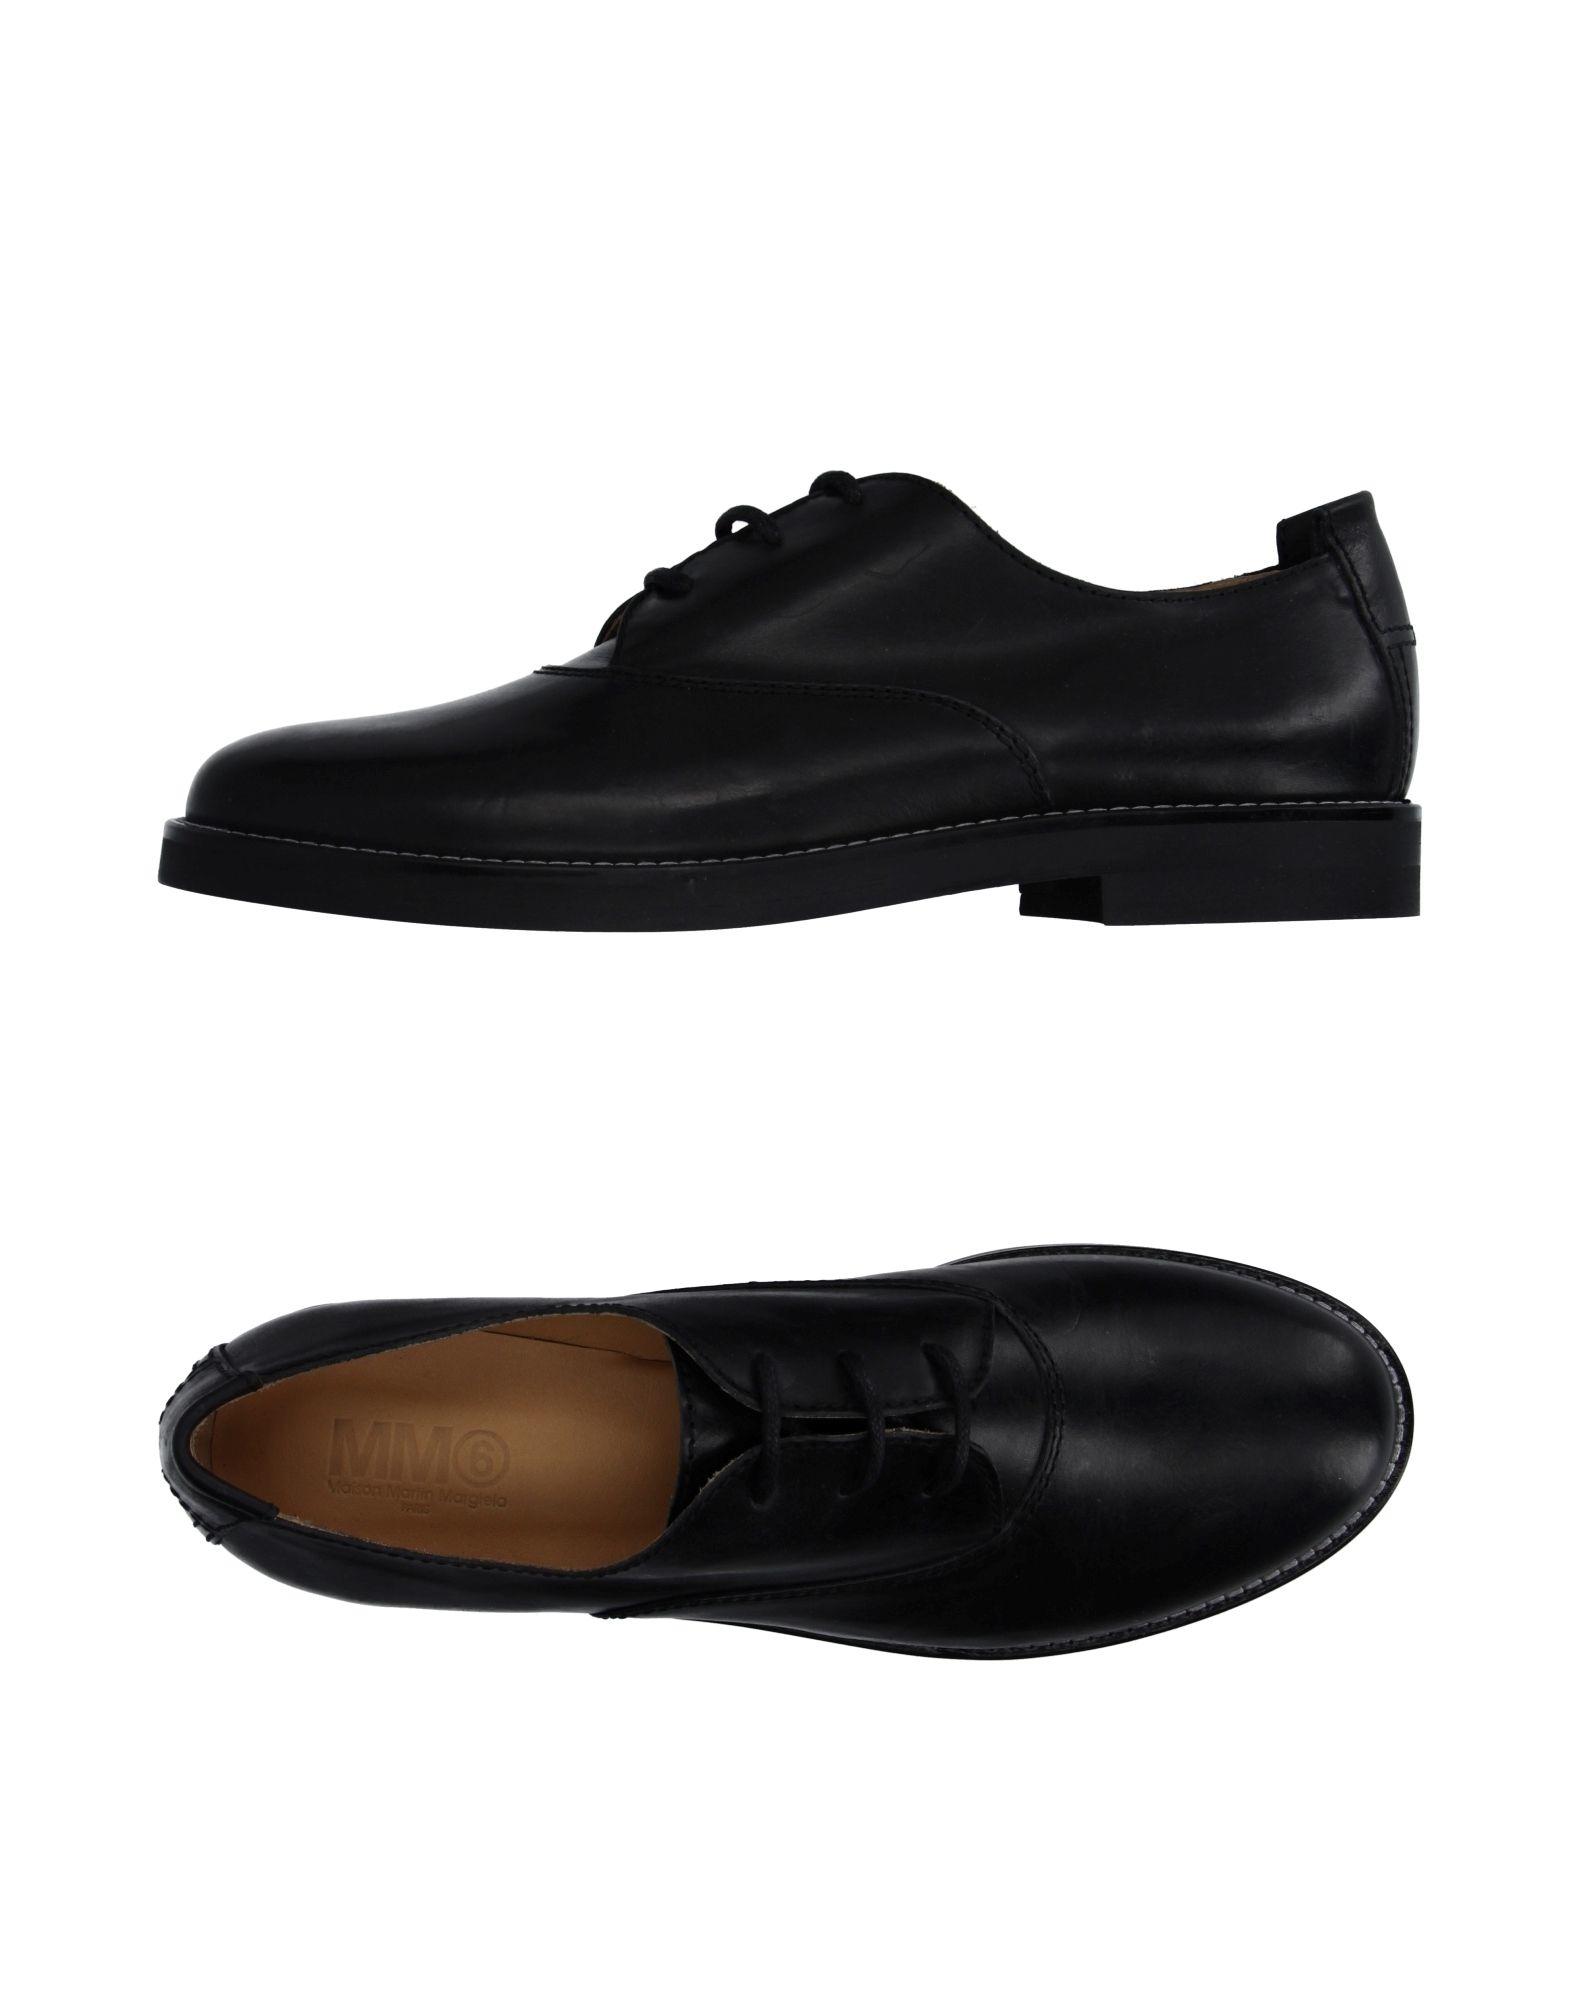 mm6 by maison martin margiela lace up shoe in black for men lyst. Black Bedroom Furniture Sets. Home Design Ideas